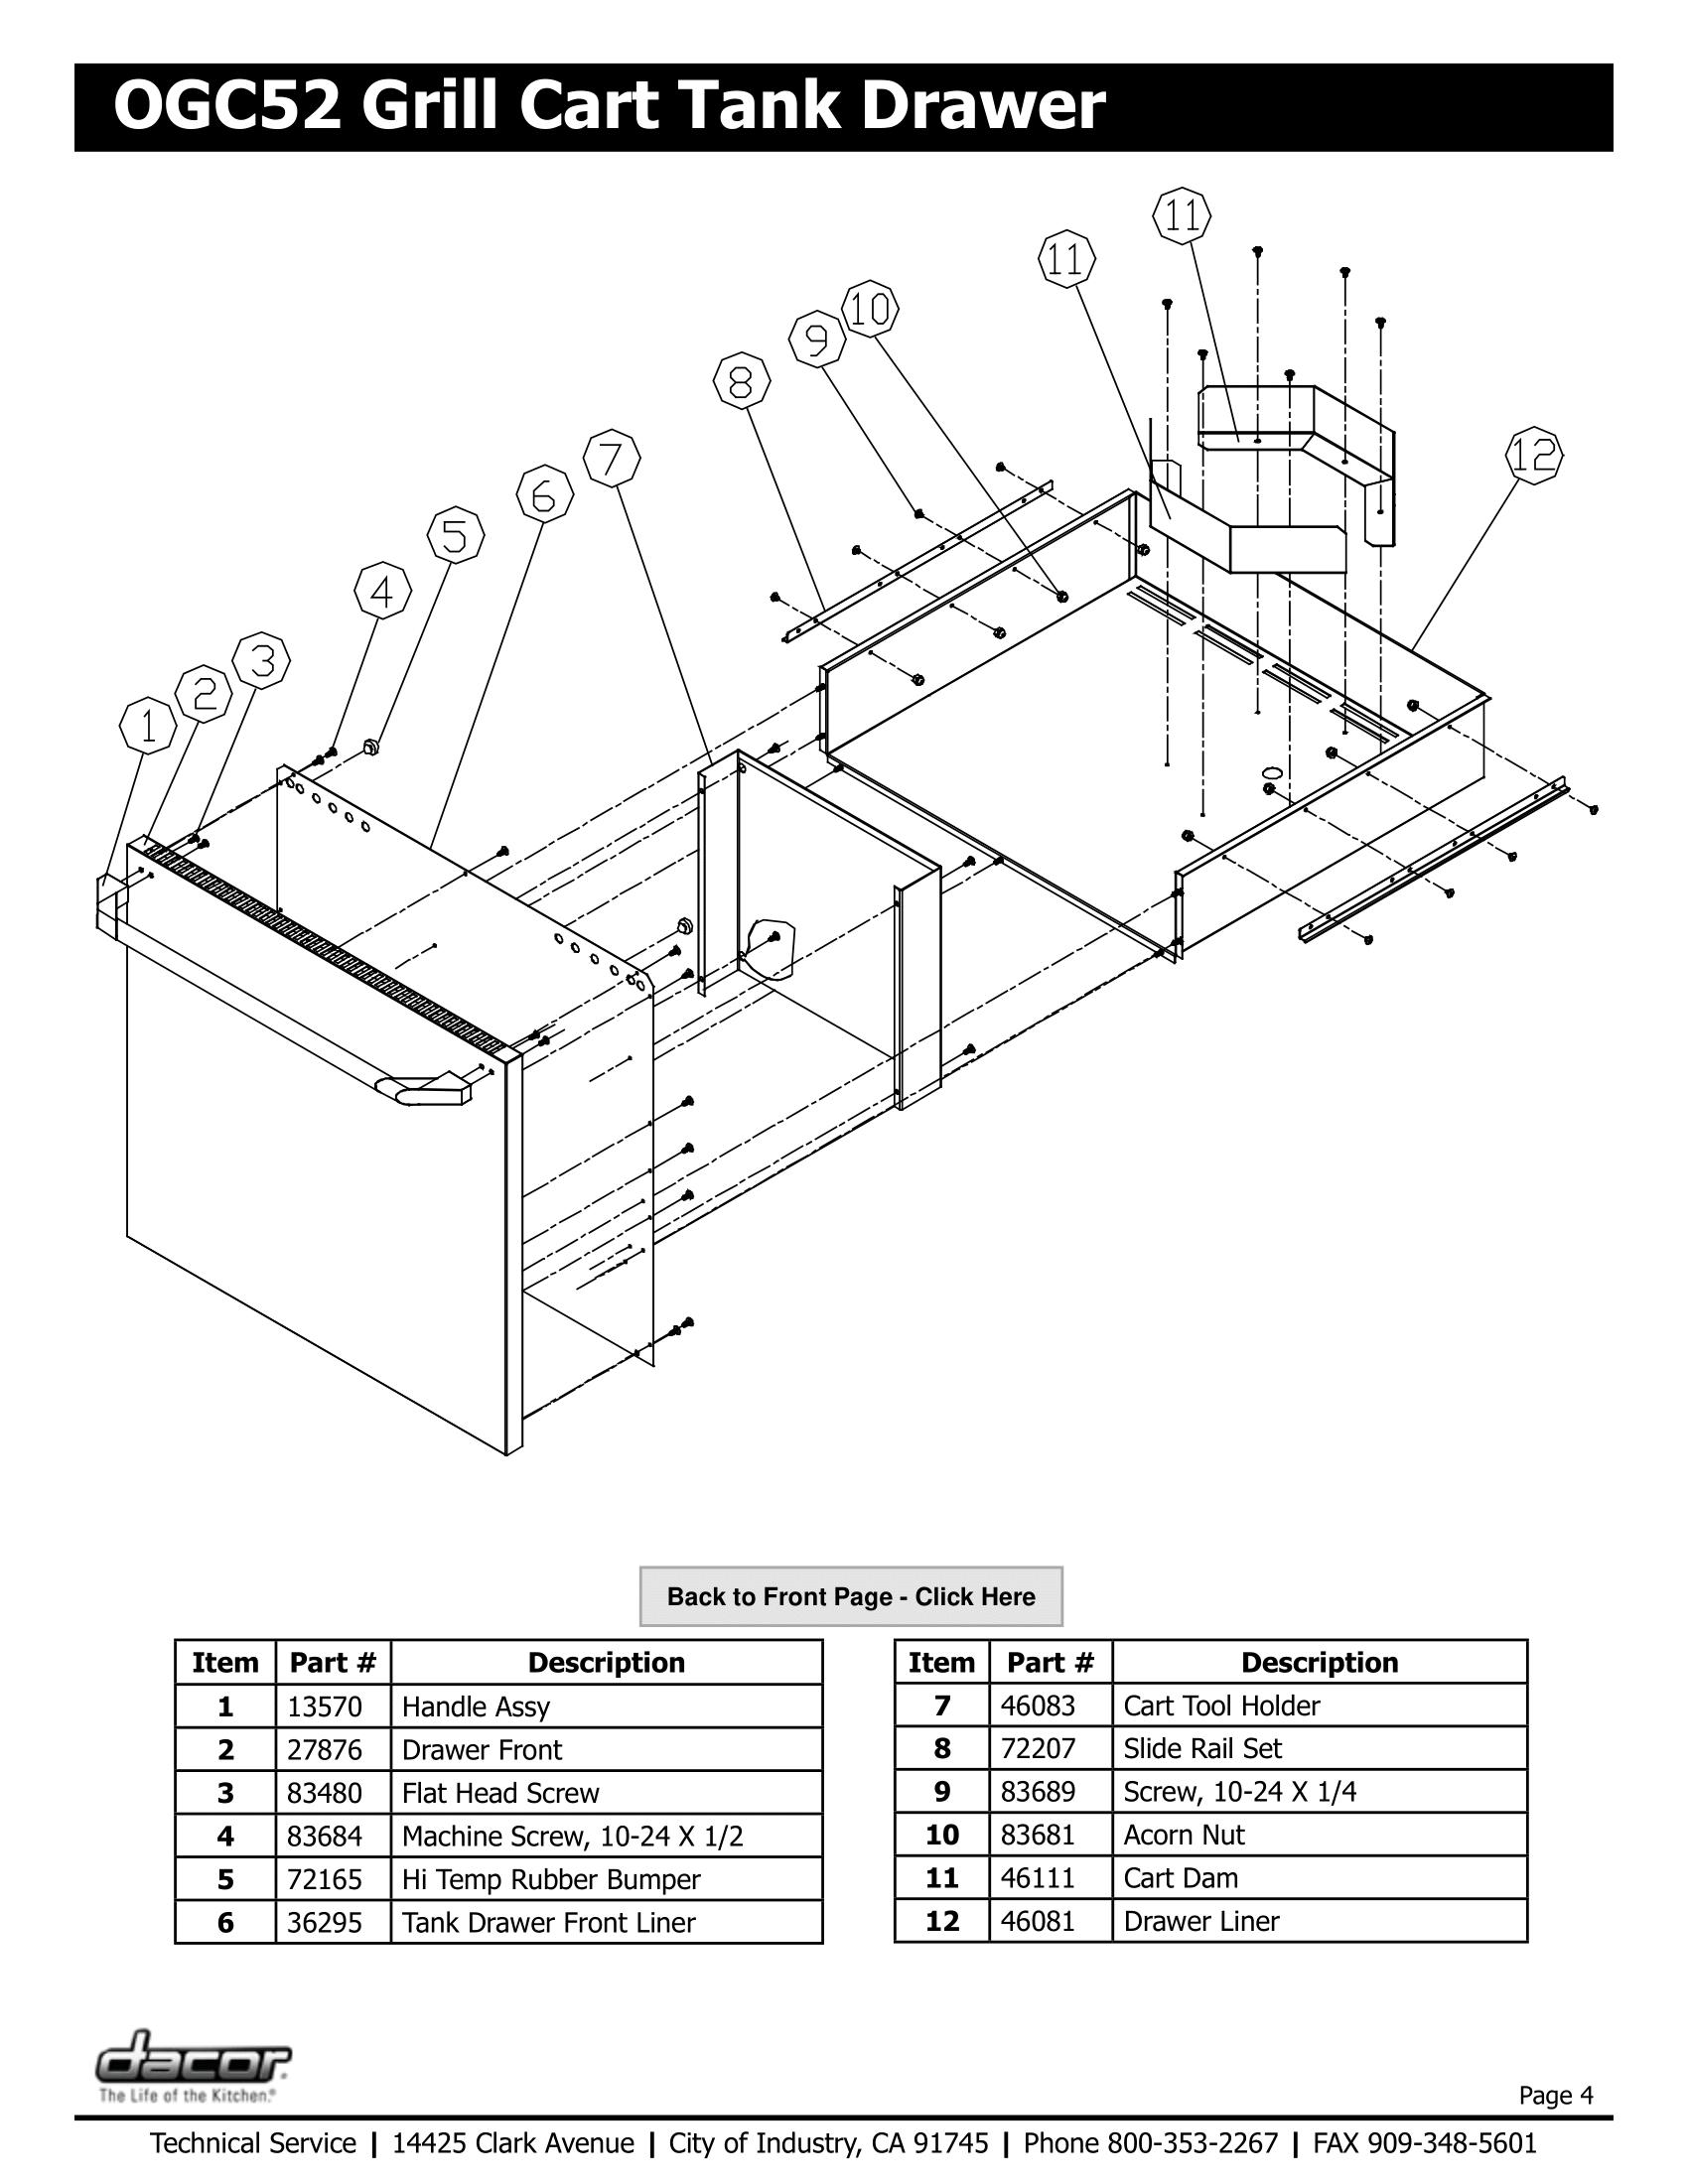 Dacor OGC52 Tank Drawer Schematic